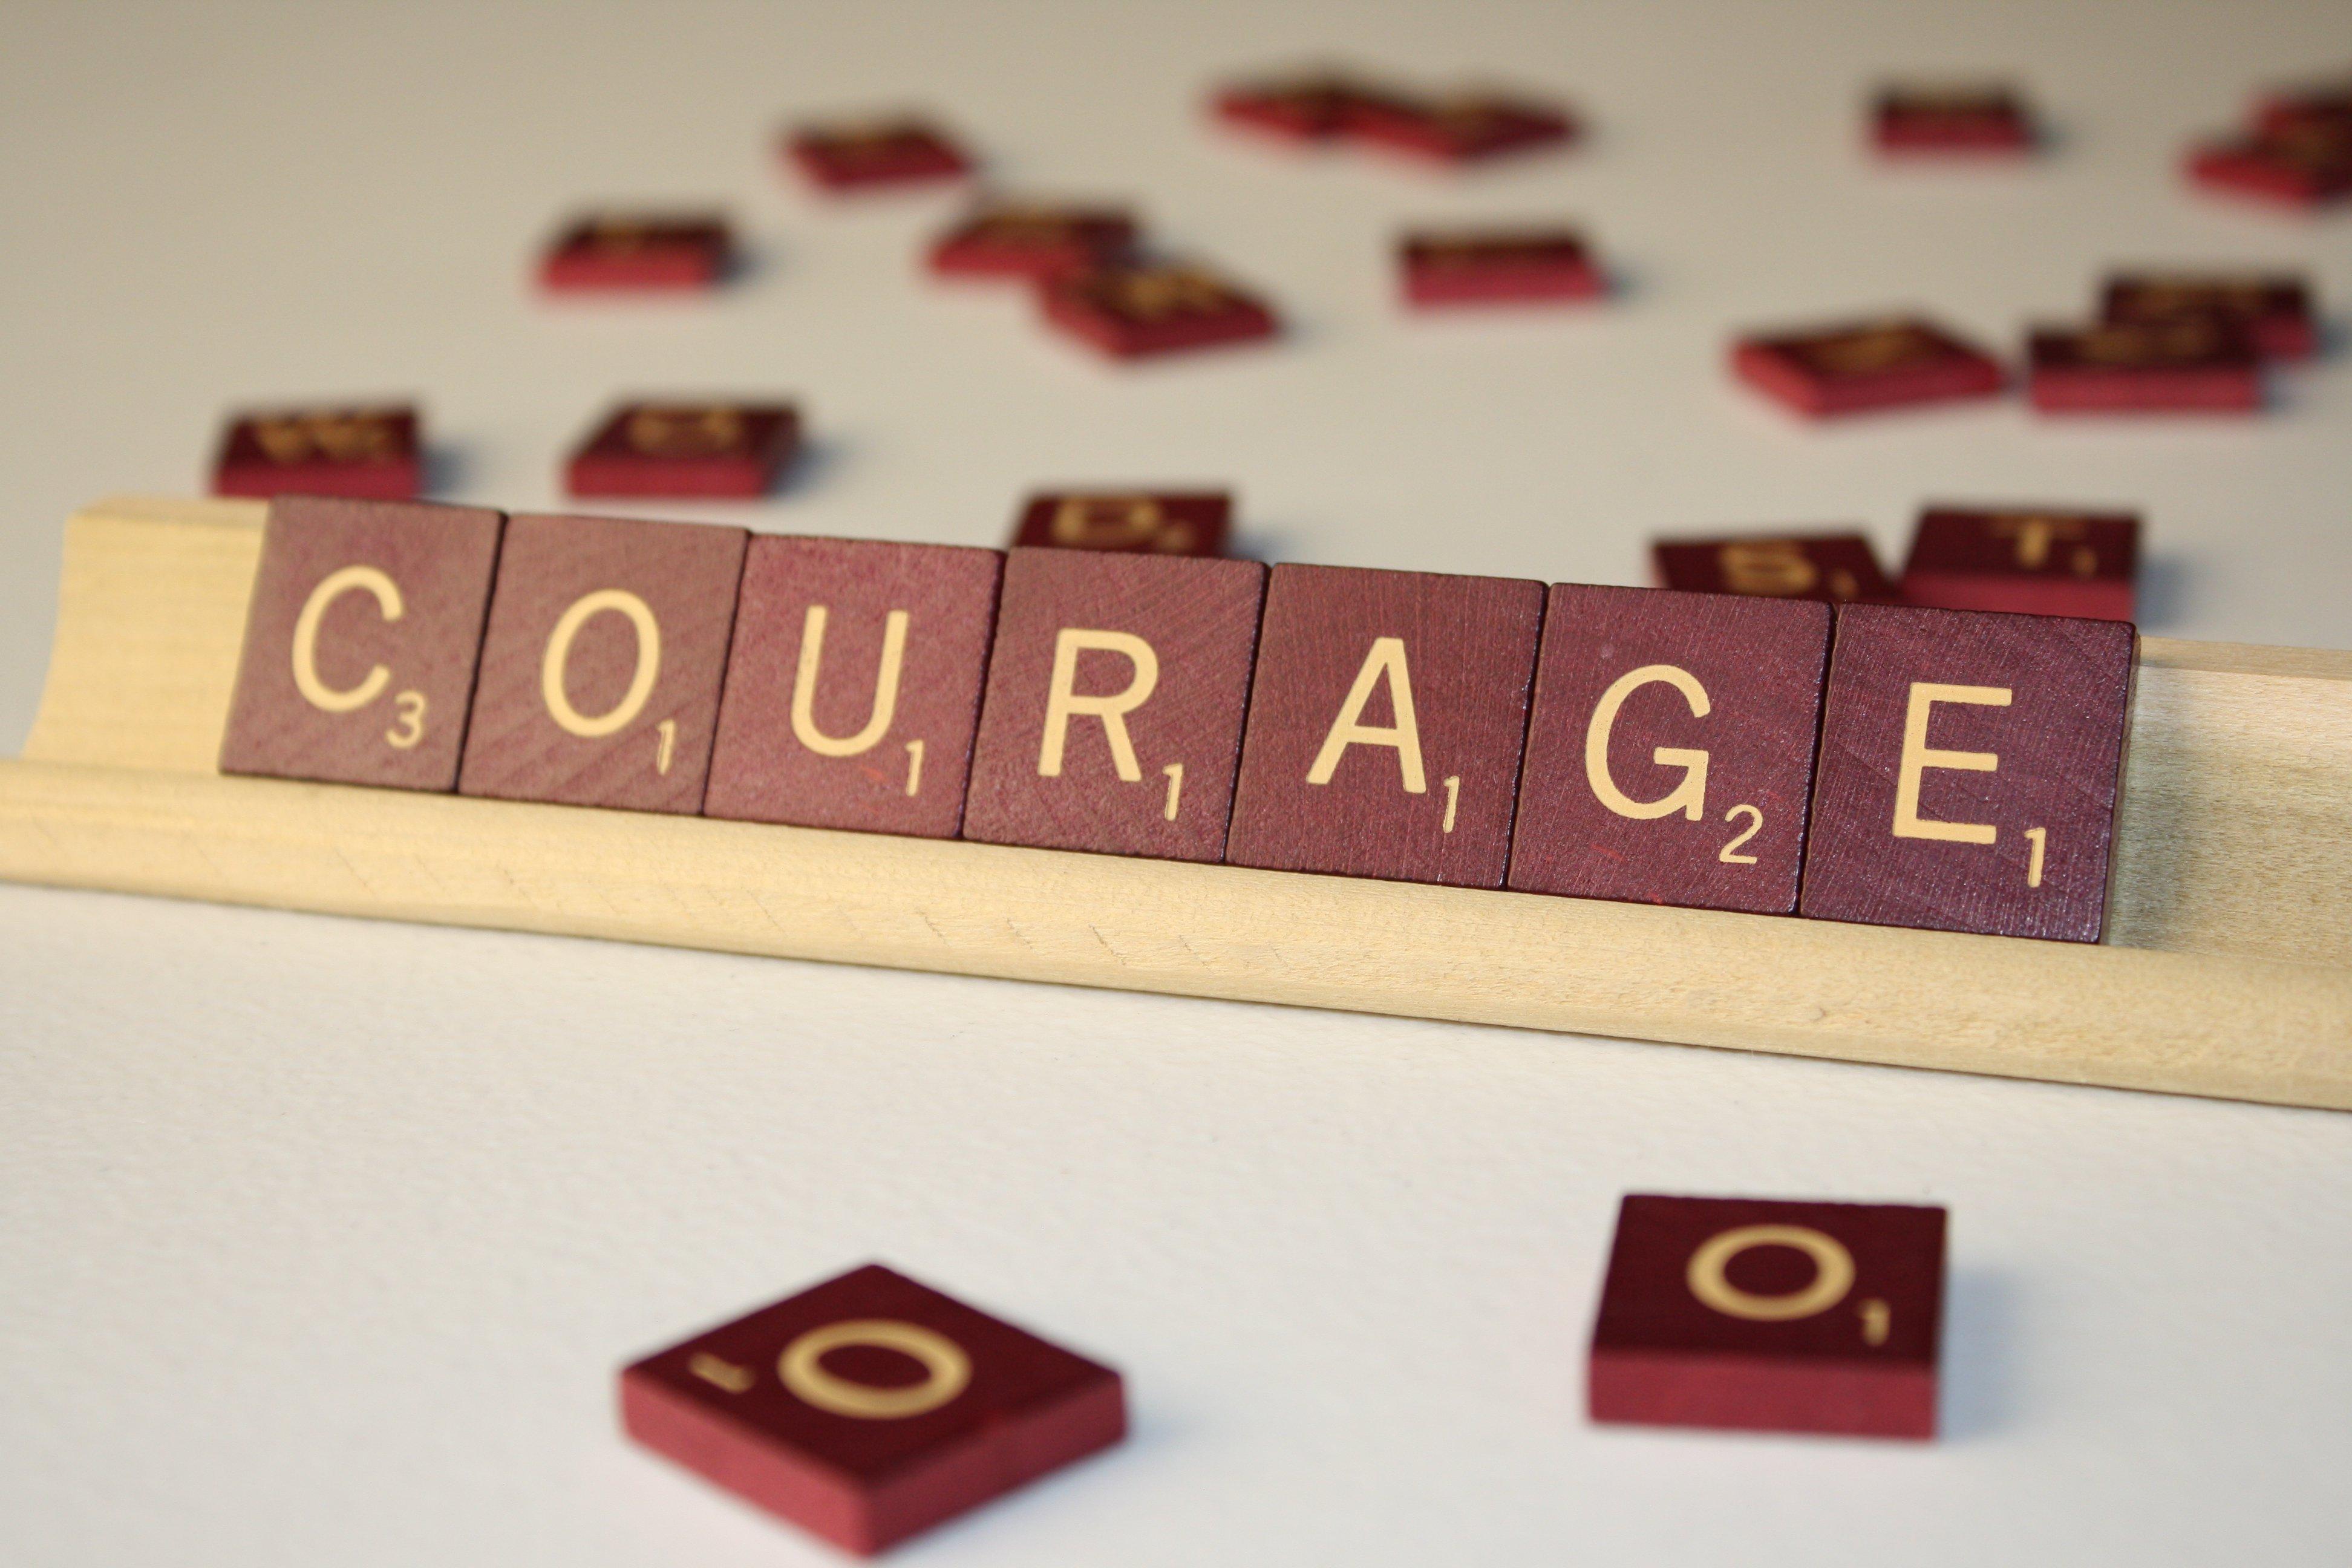 Courage Picture | Free Photograph | Photos Public Domain